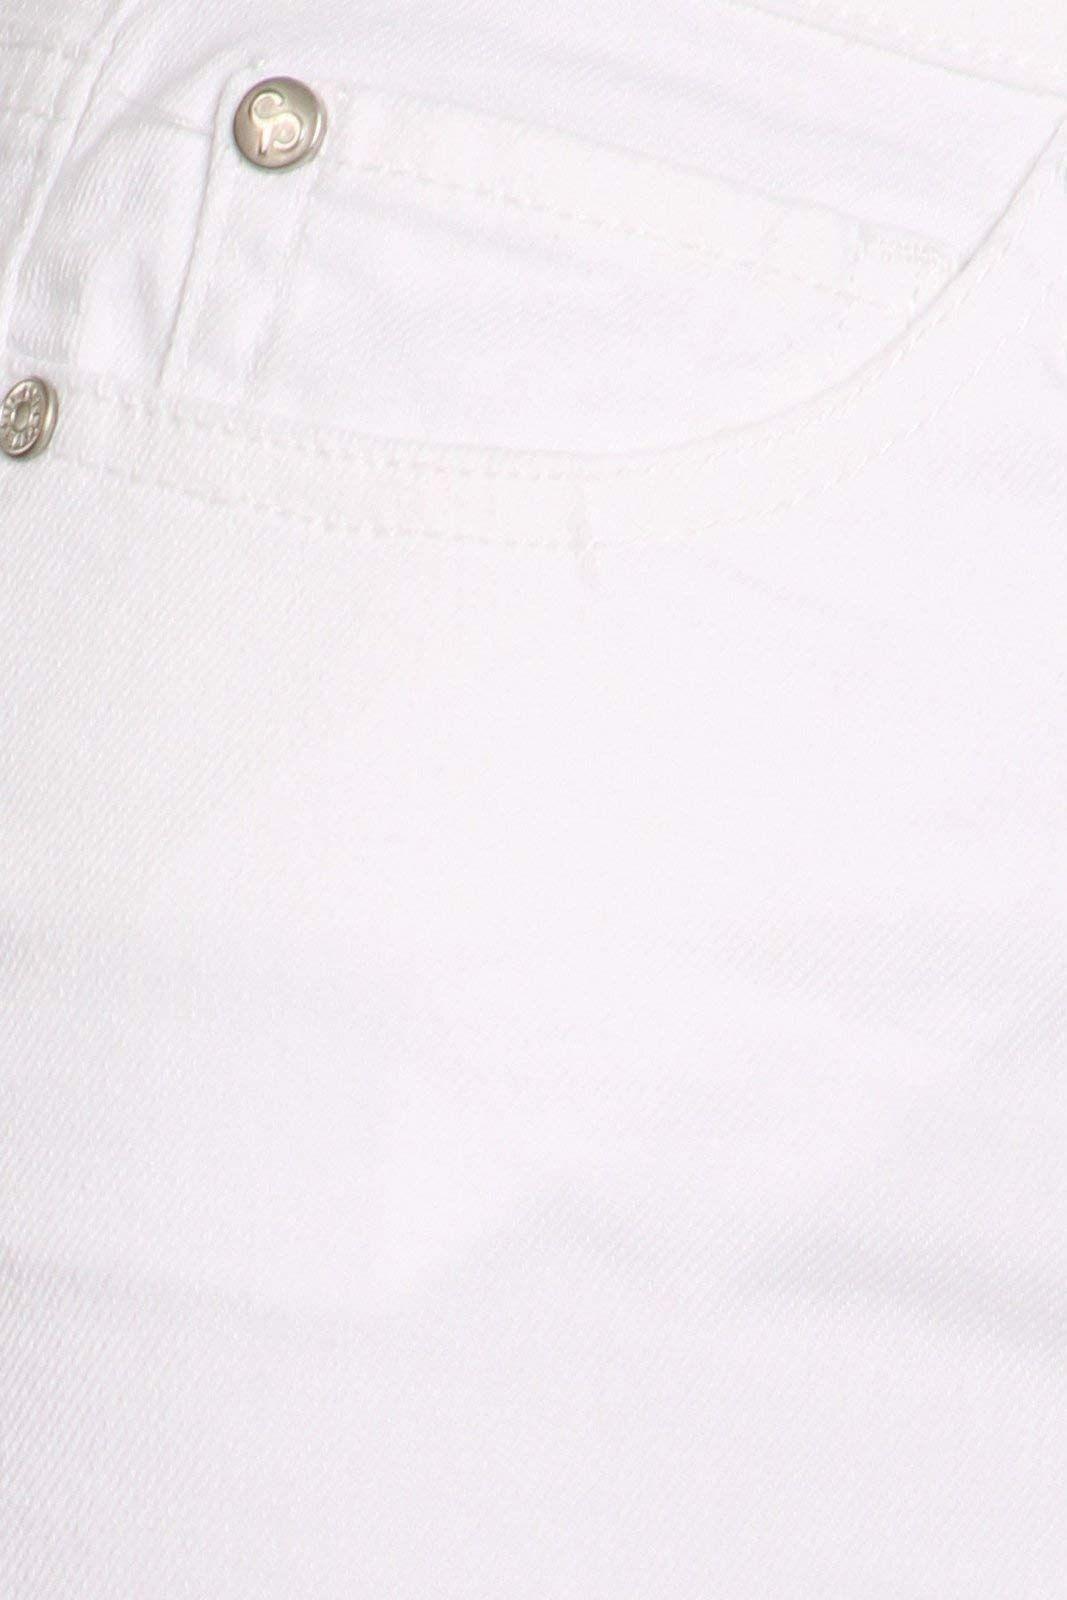 HANA+DORA Mens Shirts Slim Long Sleeves Elastic Solid Button Down Shirts Tops